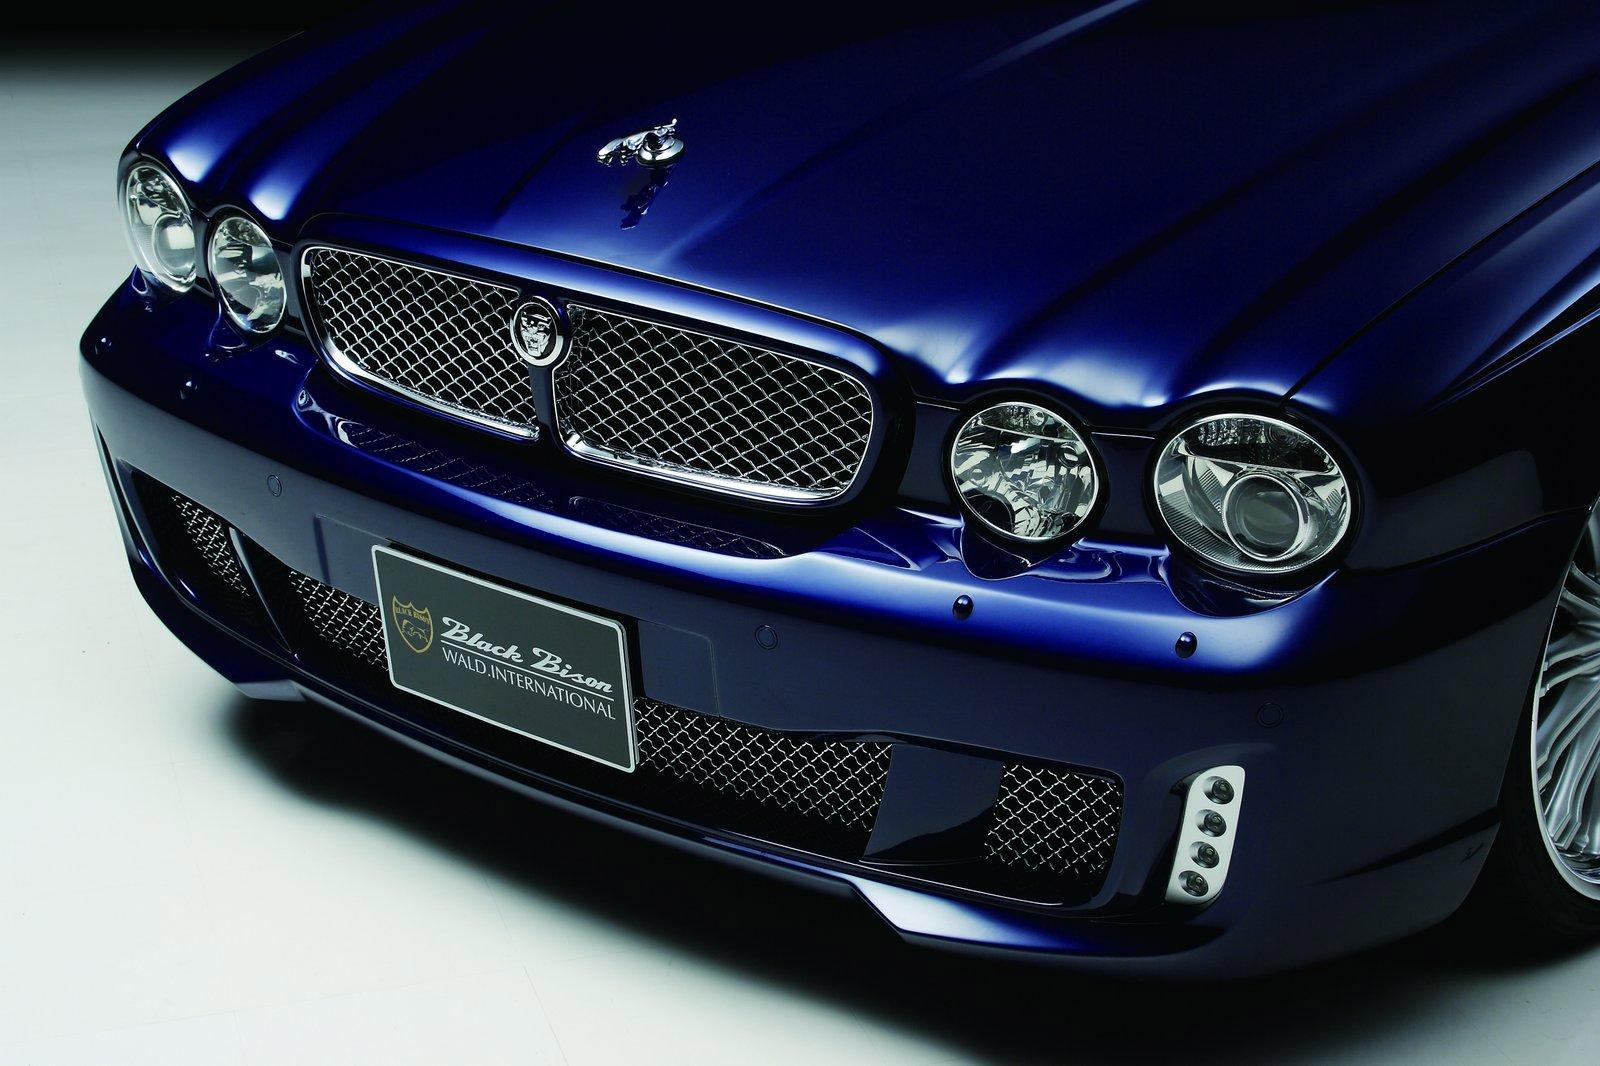 2015 Ford Taurus Sho >> Wald Jaguar XJ X350 Black Bison Edition - Picture 56904